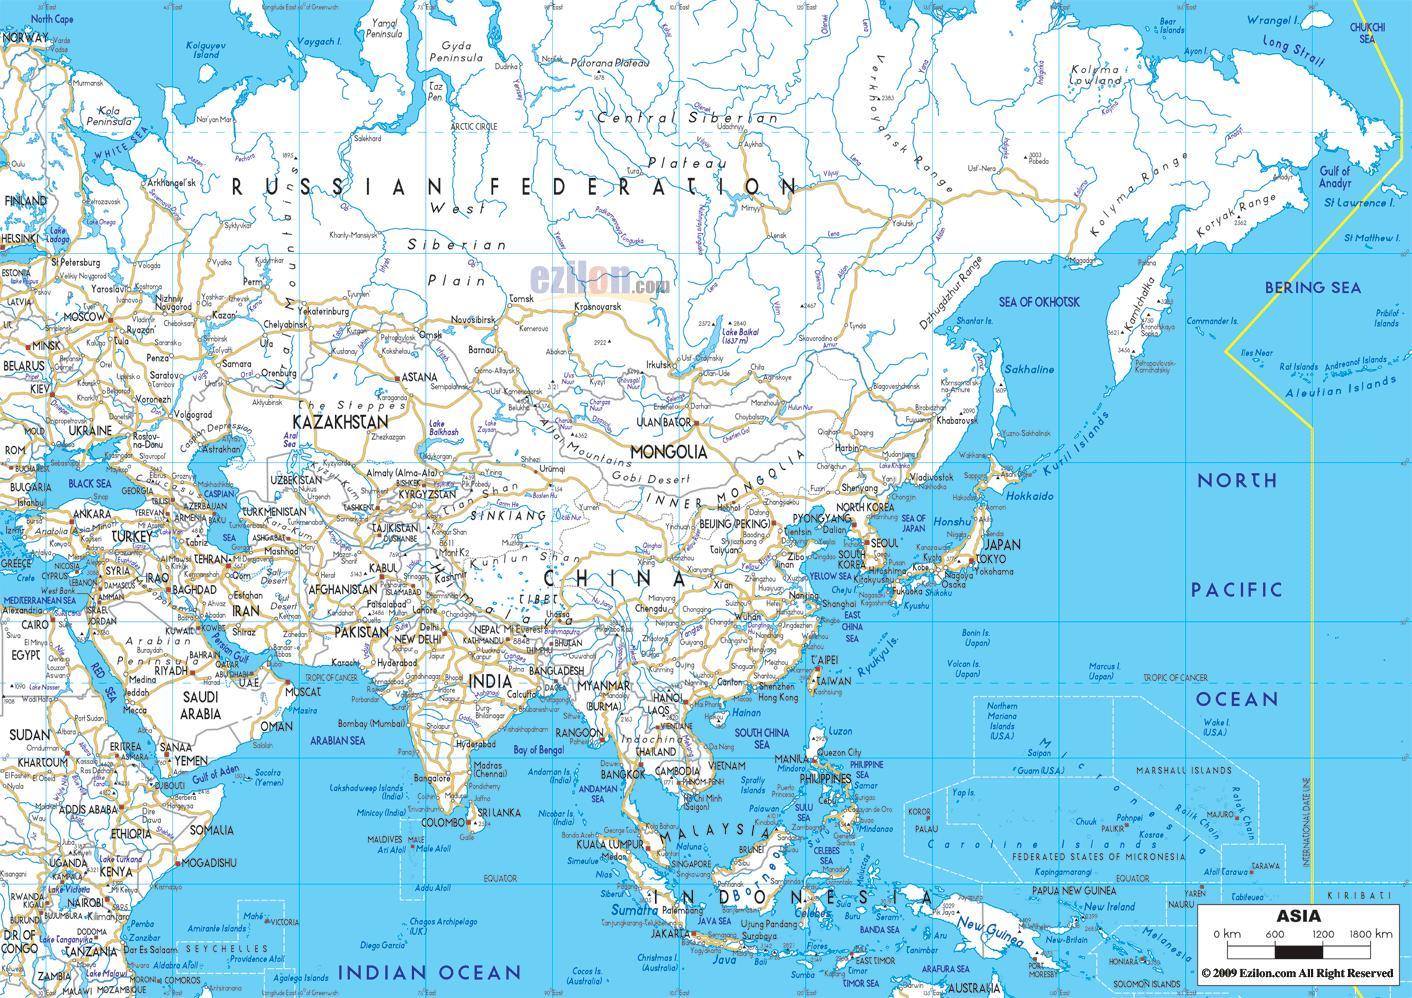 Rusia Road Map Mapa De Carreteras De Rusia Europa Del Este